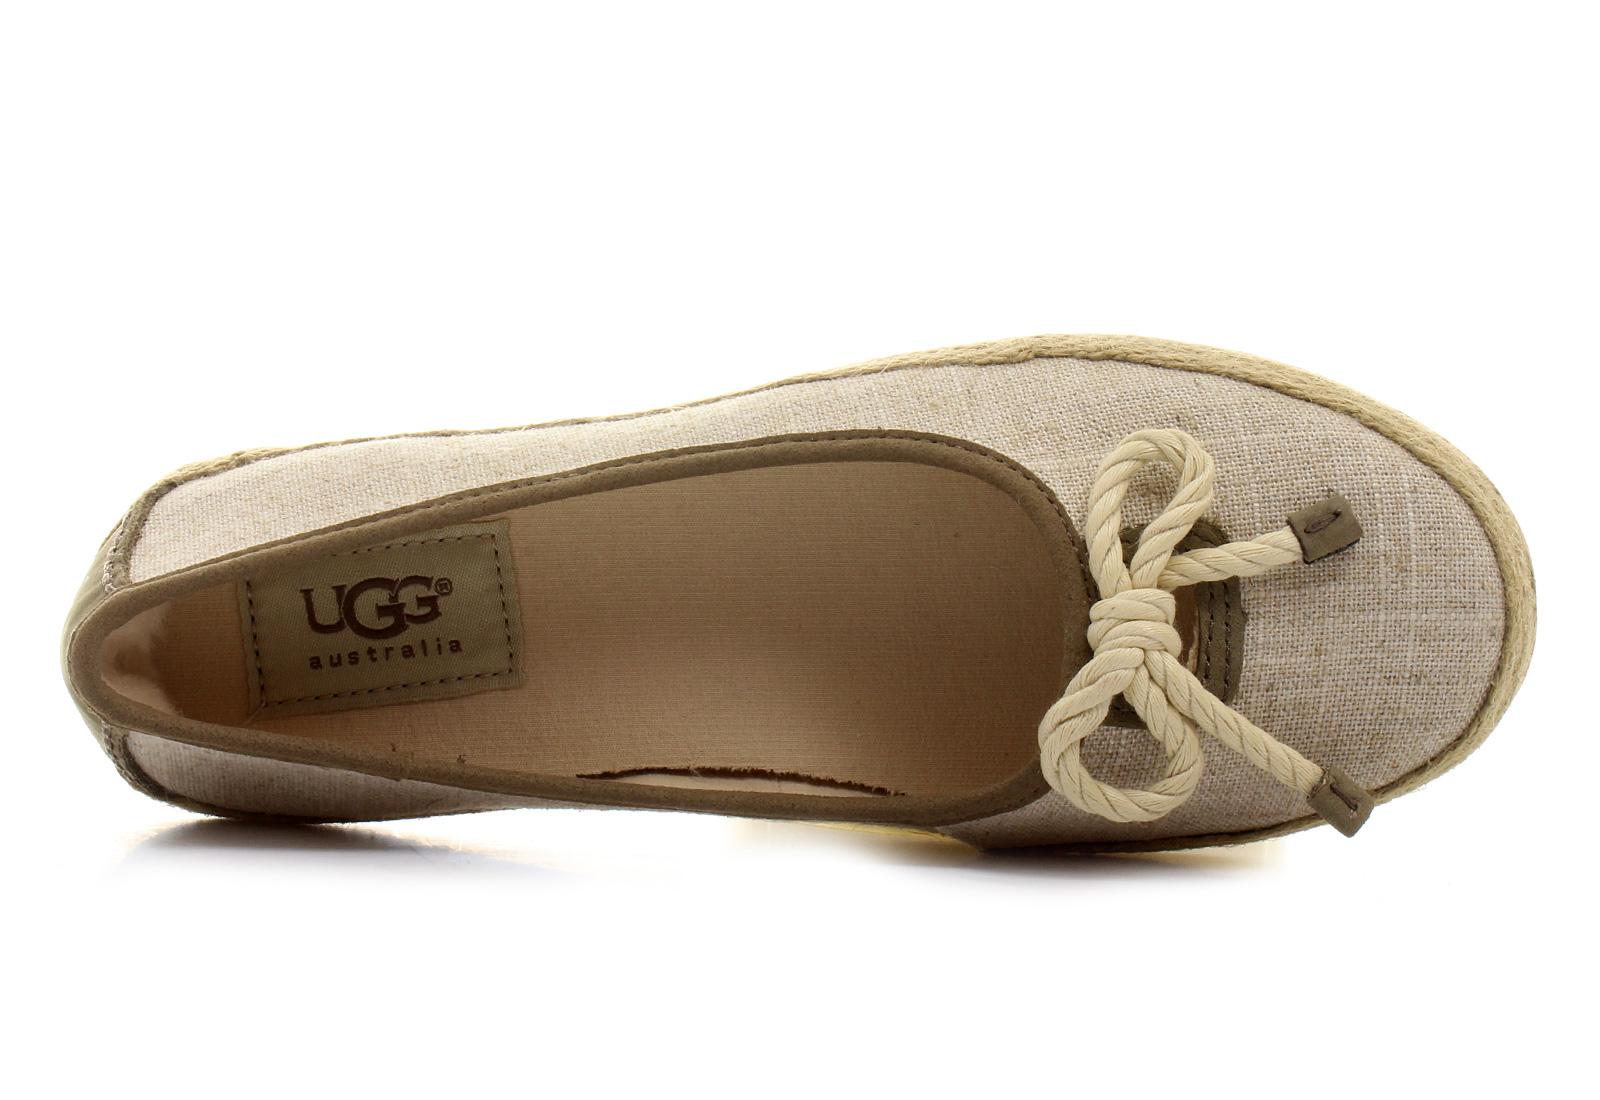 Ugg Syleste Flat Slip On Shoes